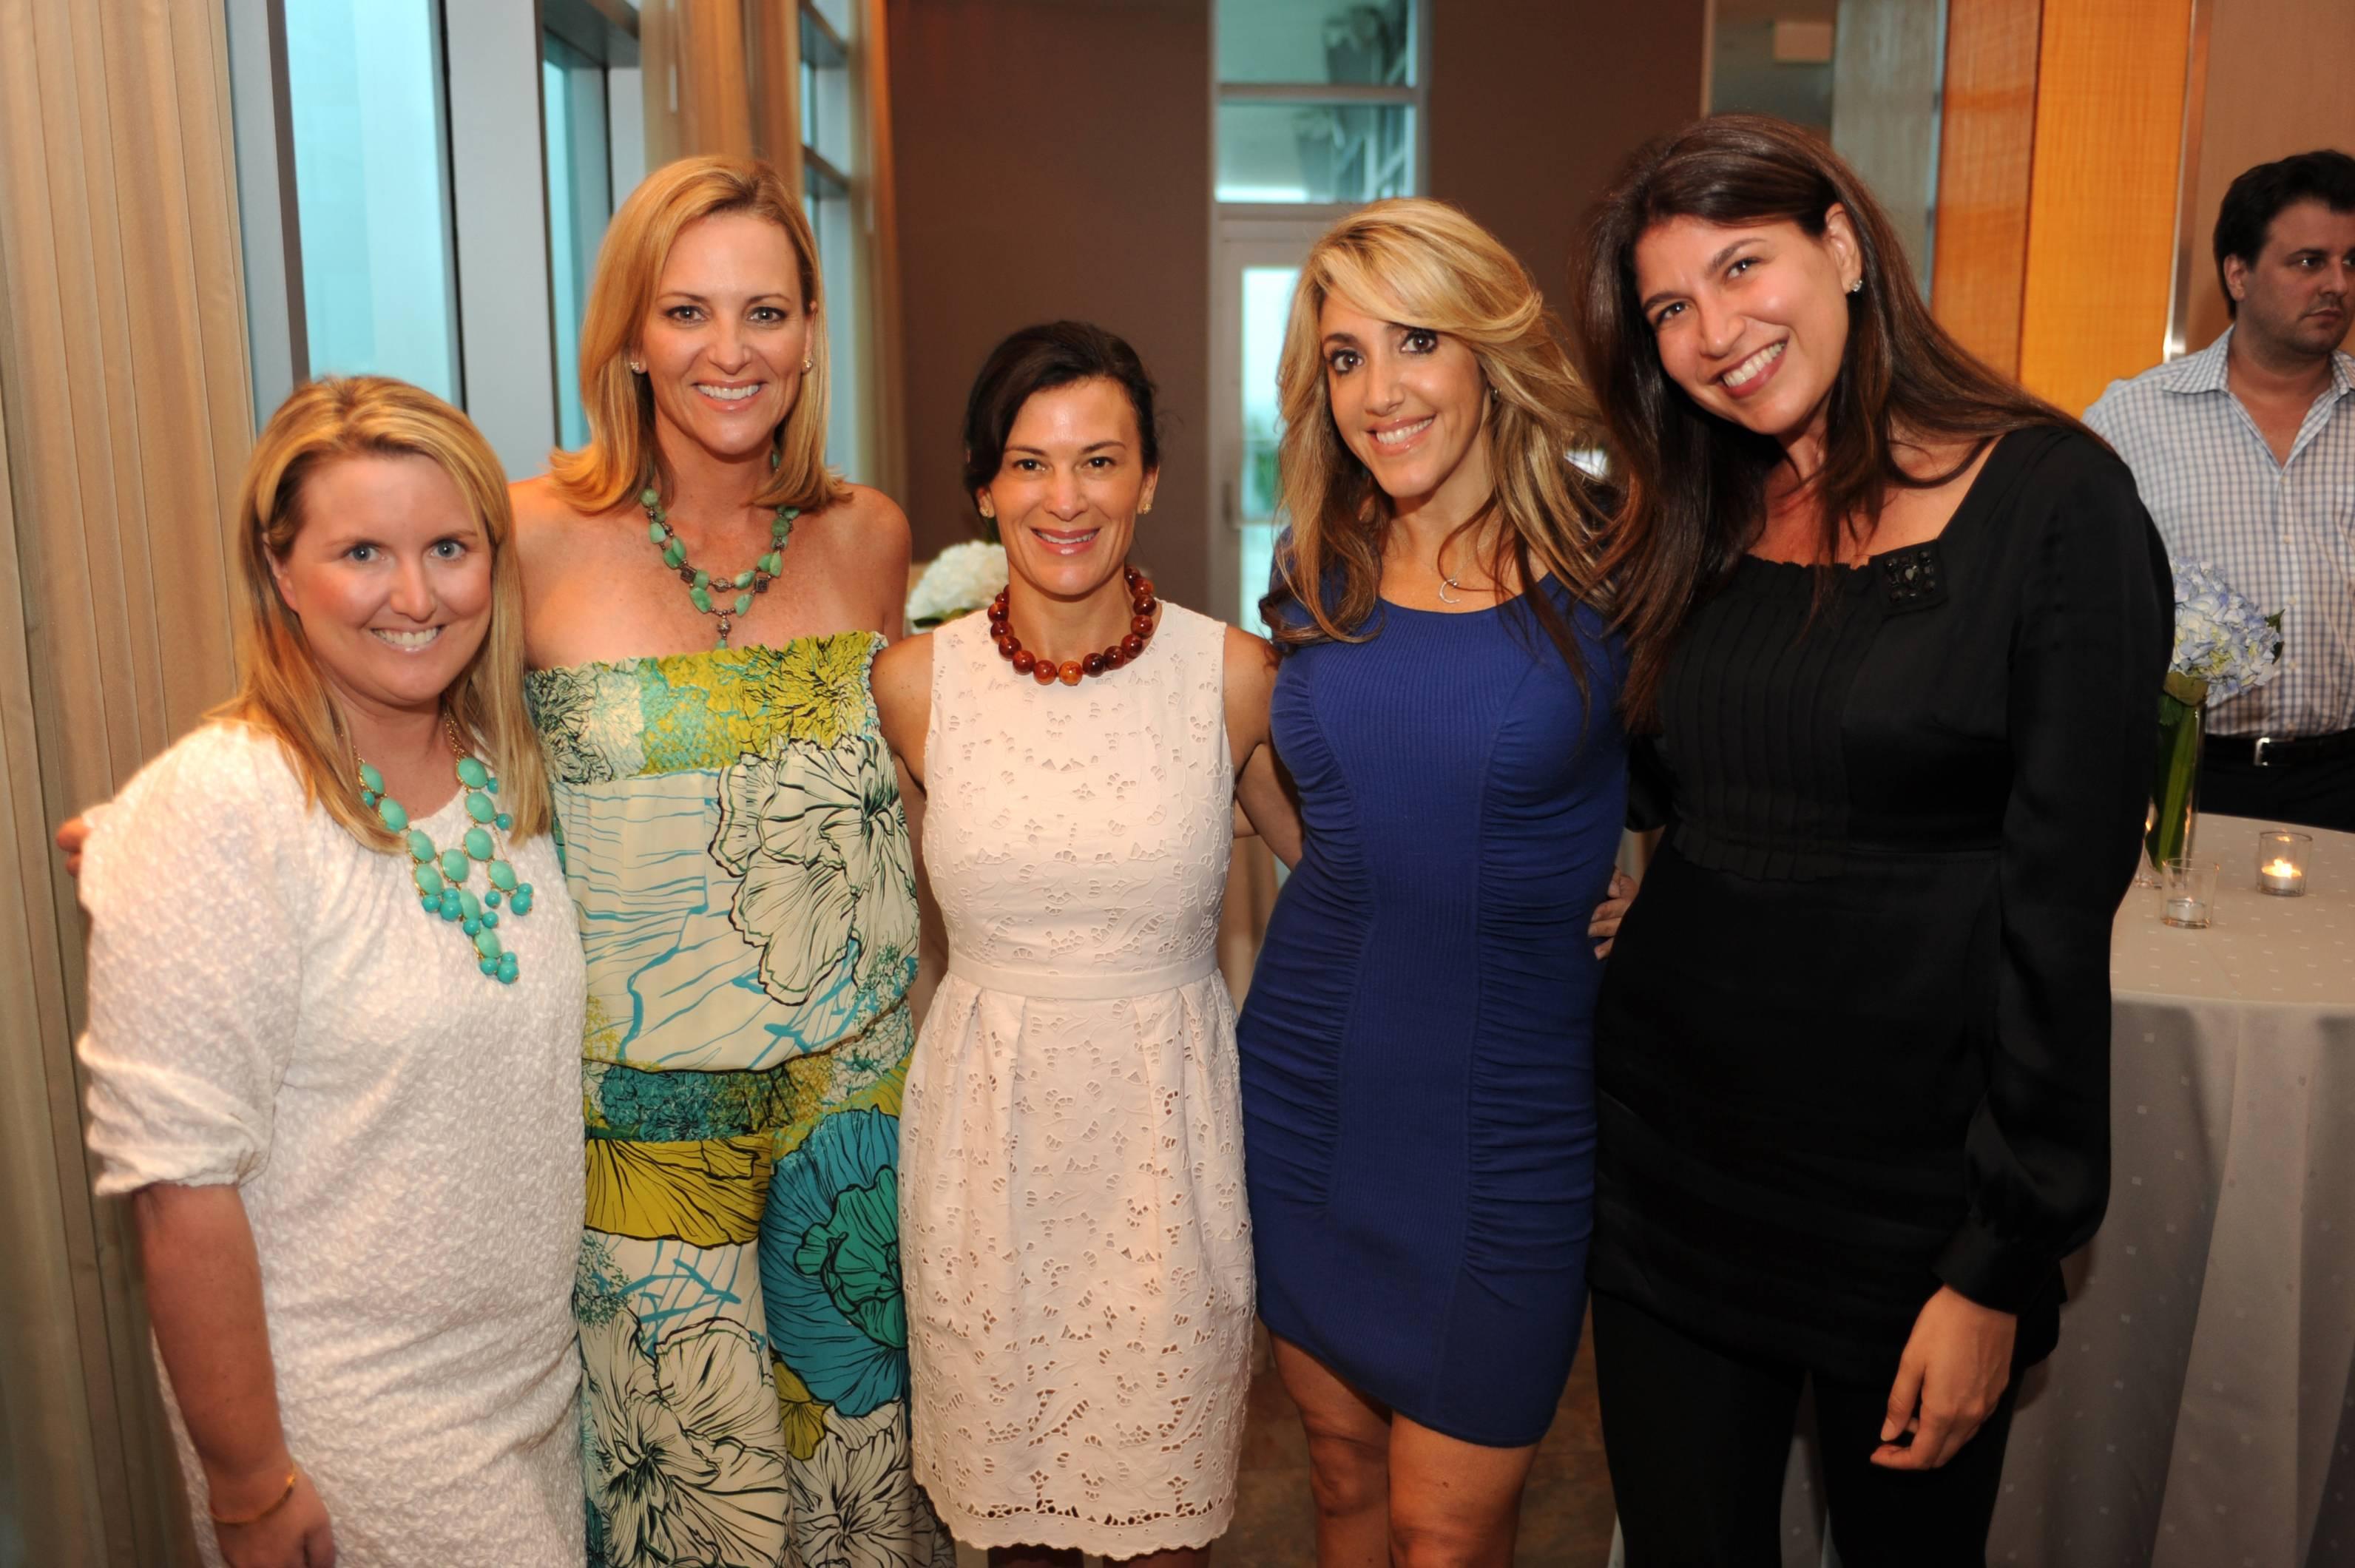 Mary Killeen, Lisa Petrillo, Sarah Harrelson, Jillian Jacobson Altit and Carolyn Travis